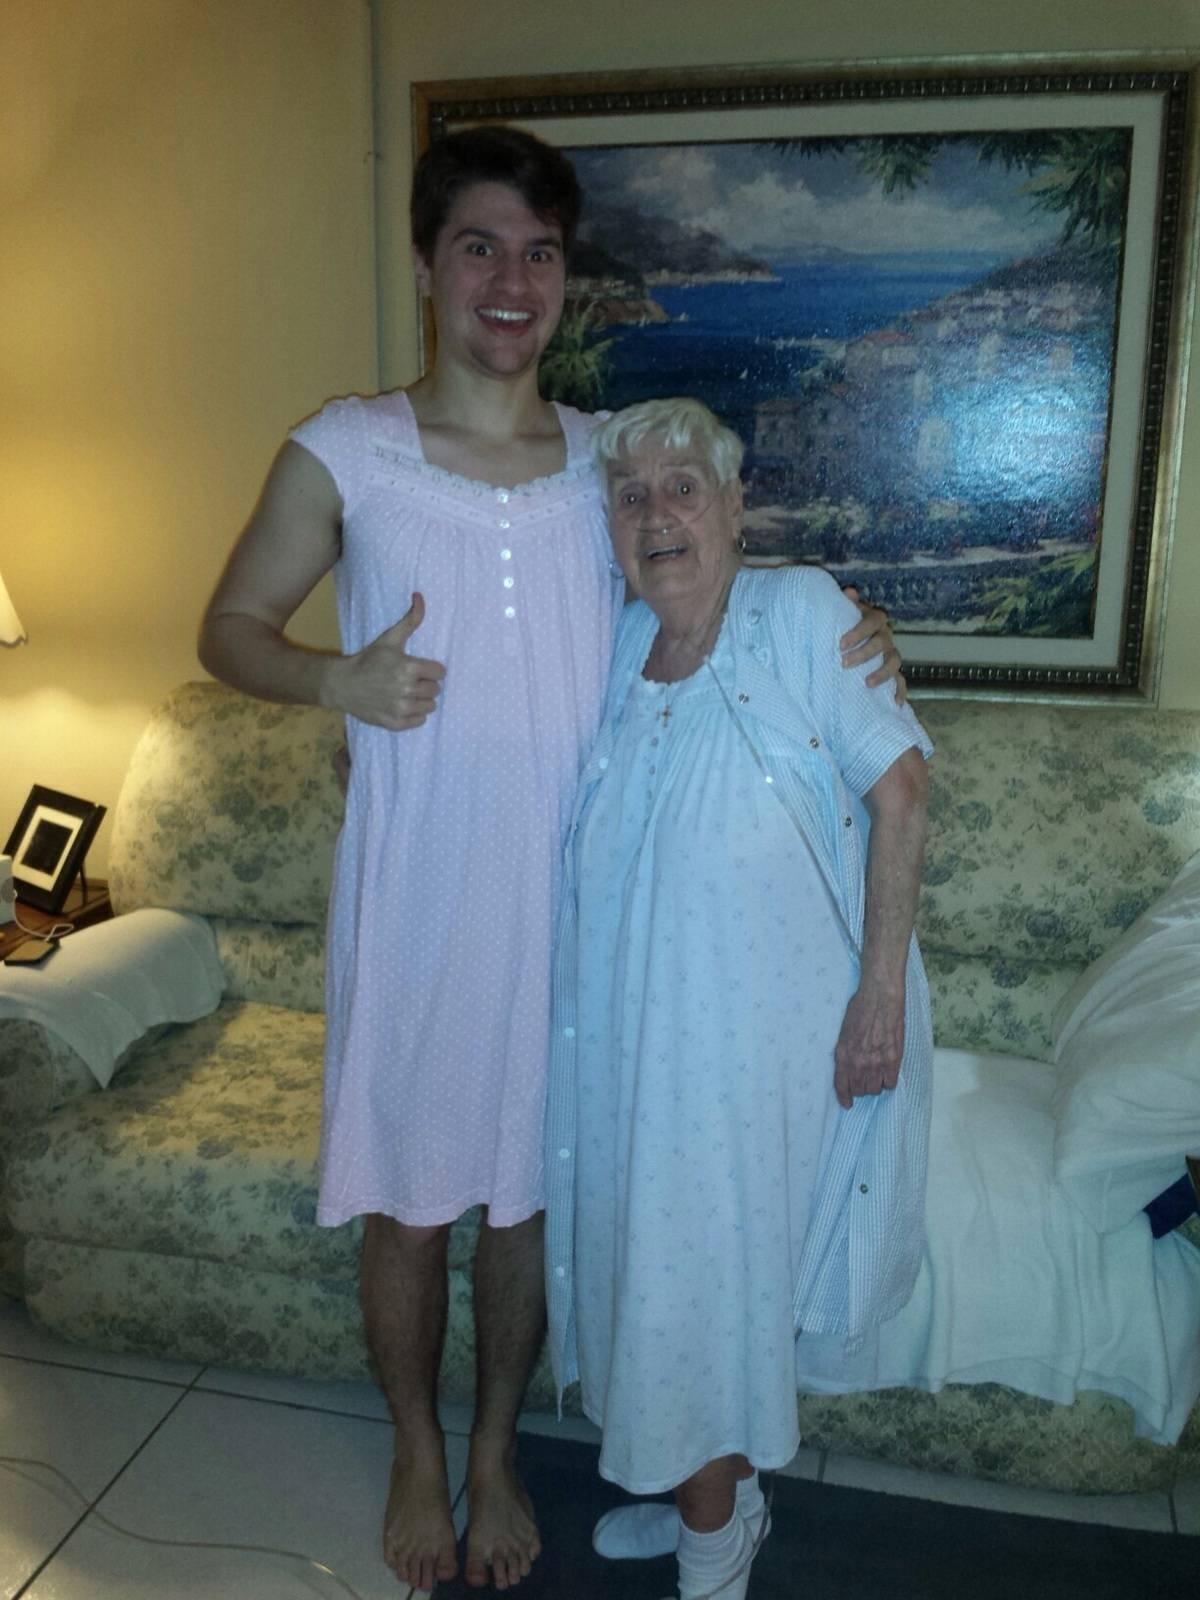 grandma bought grandson a nightgown